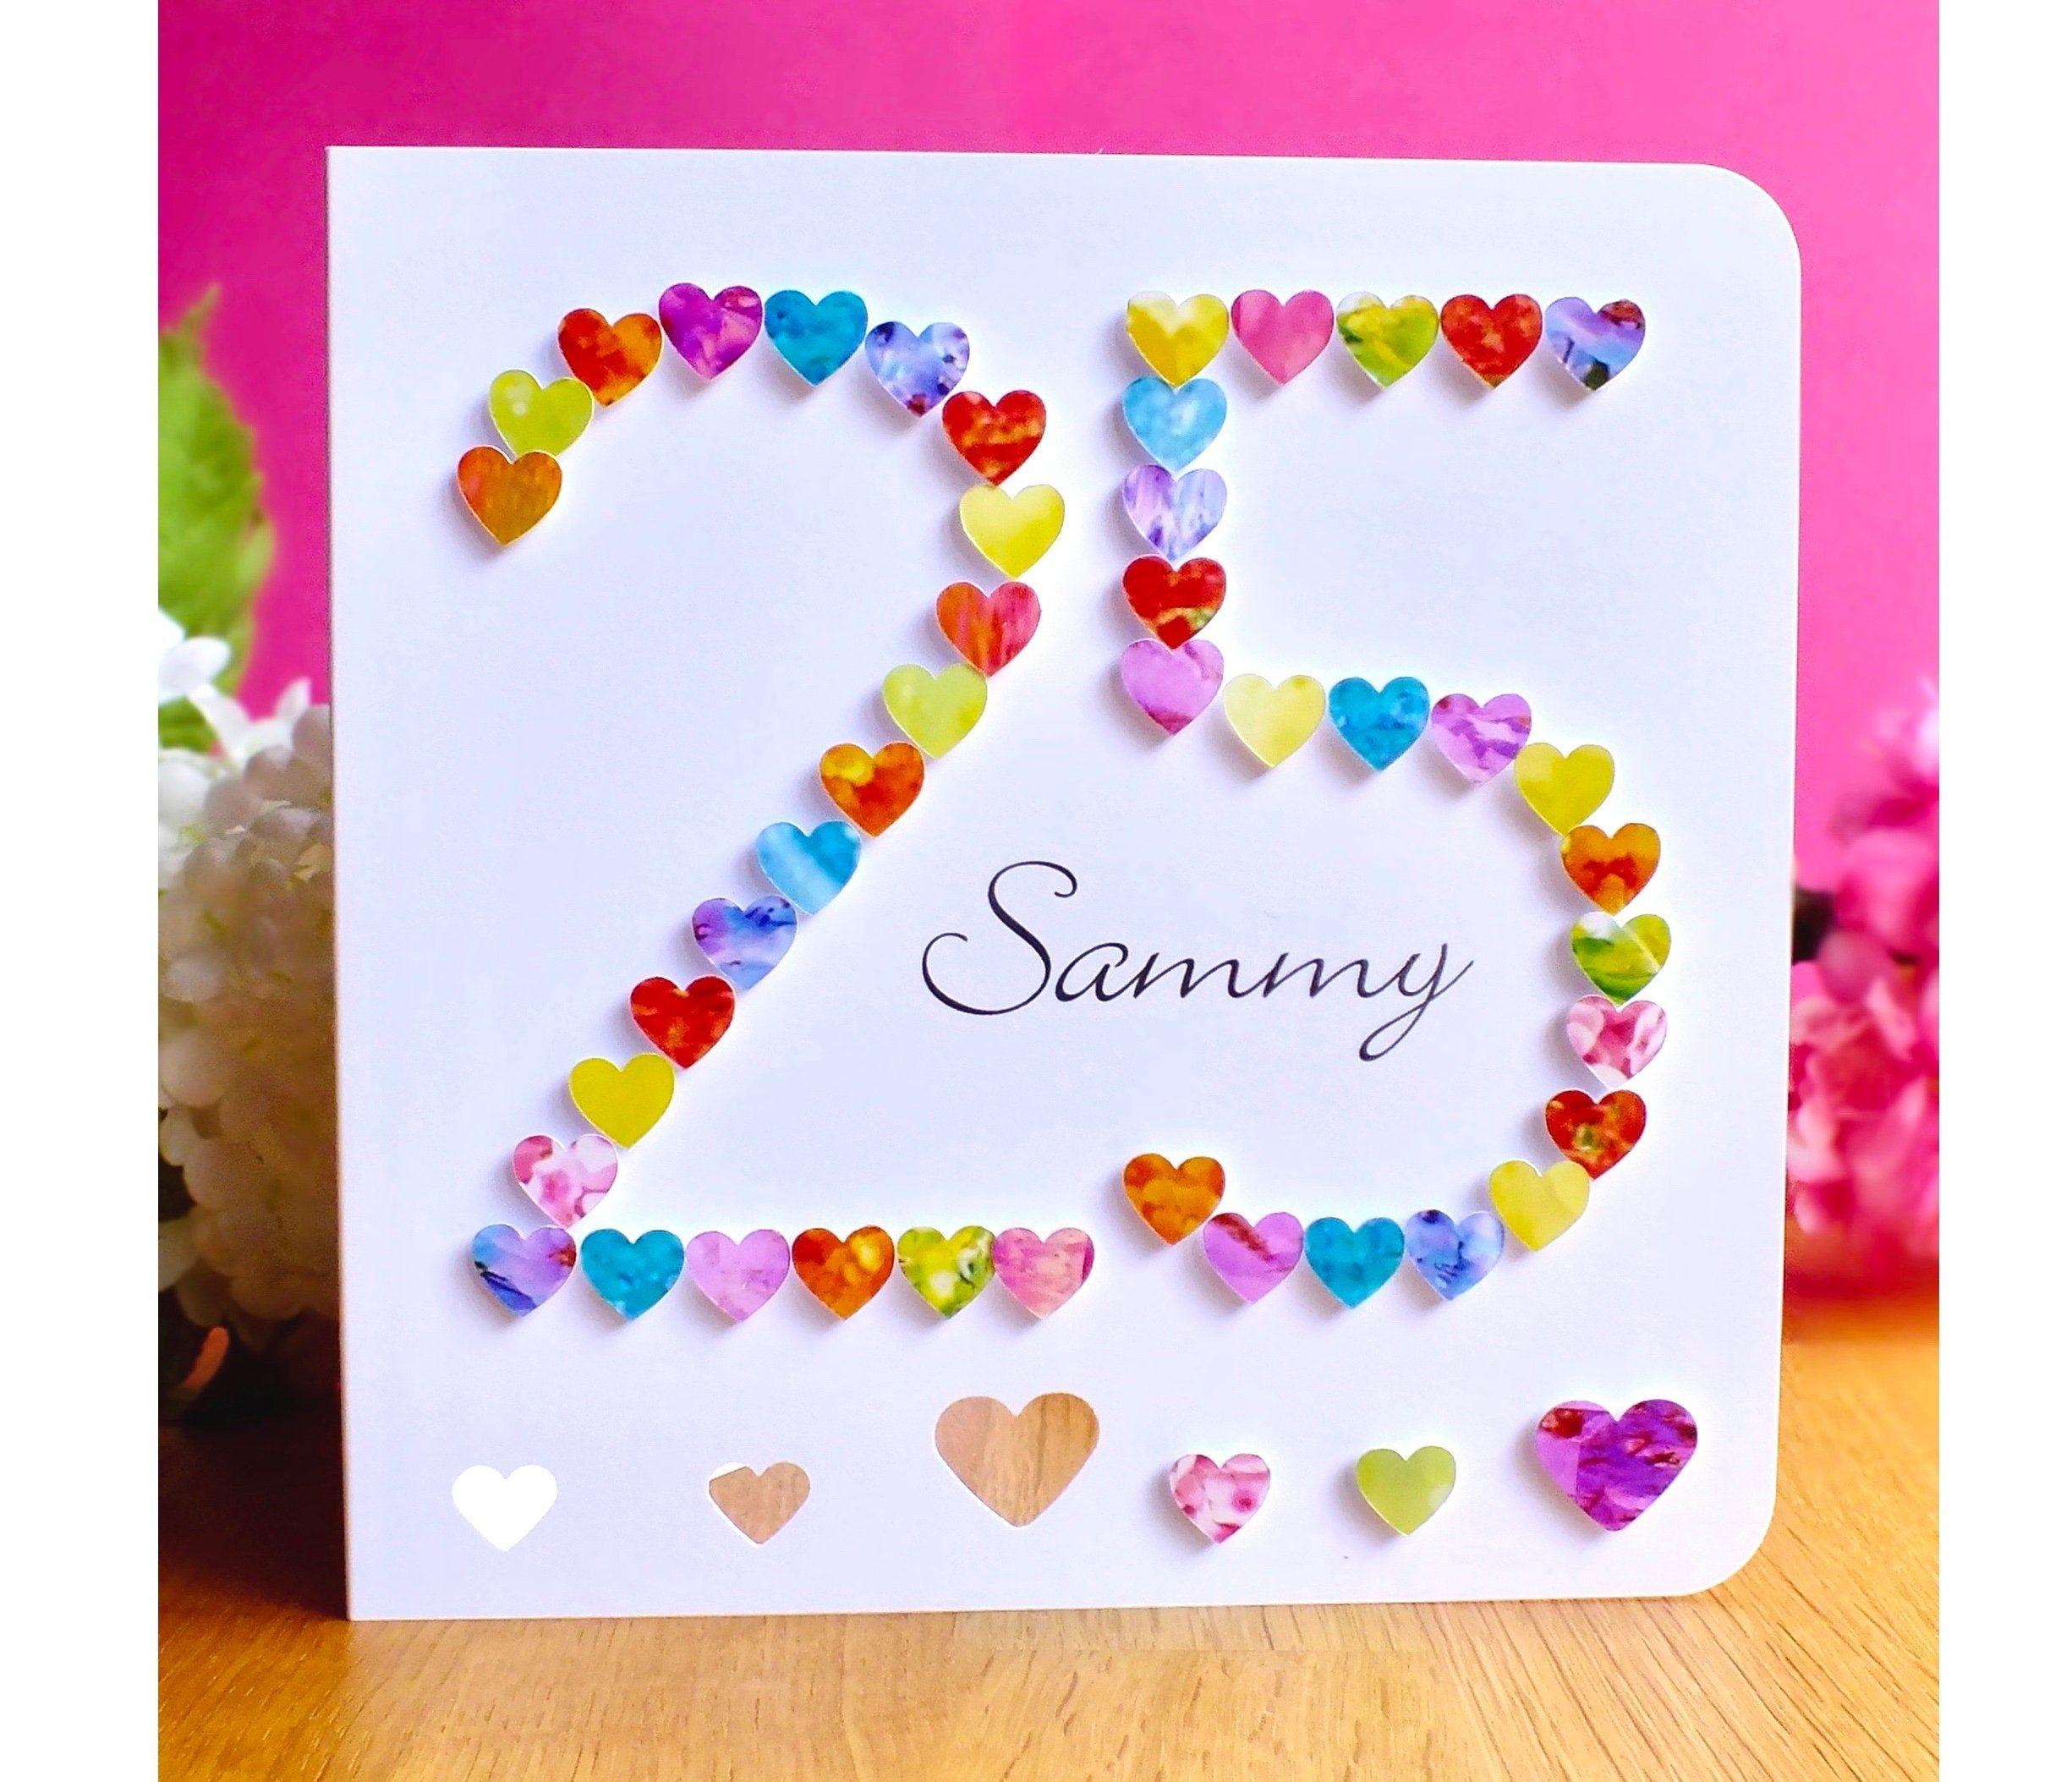 25th Birthday Card Handmade Personalised Age 25 Birthday Etsy Handmade Birthday Cards Birthday Cards 25th Birthday